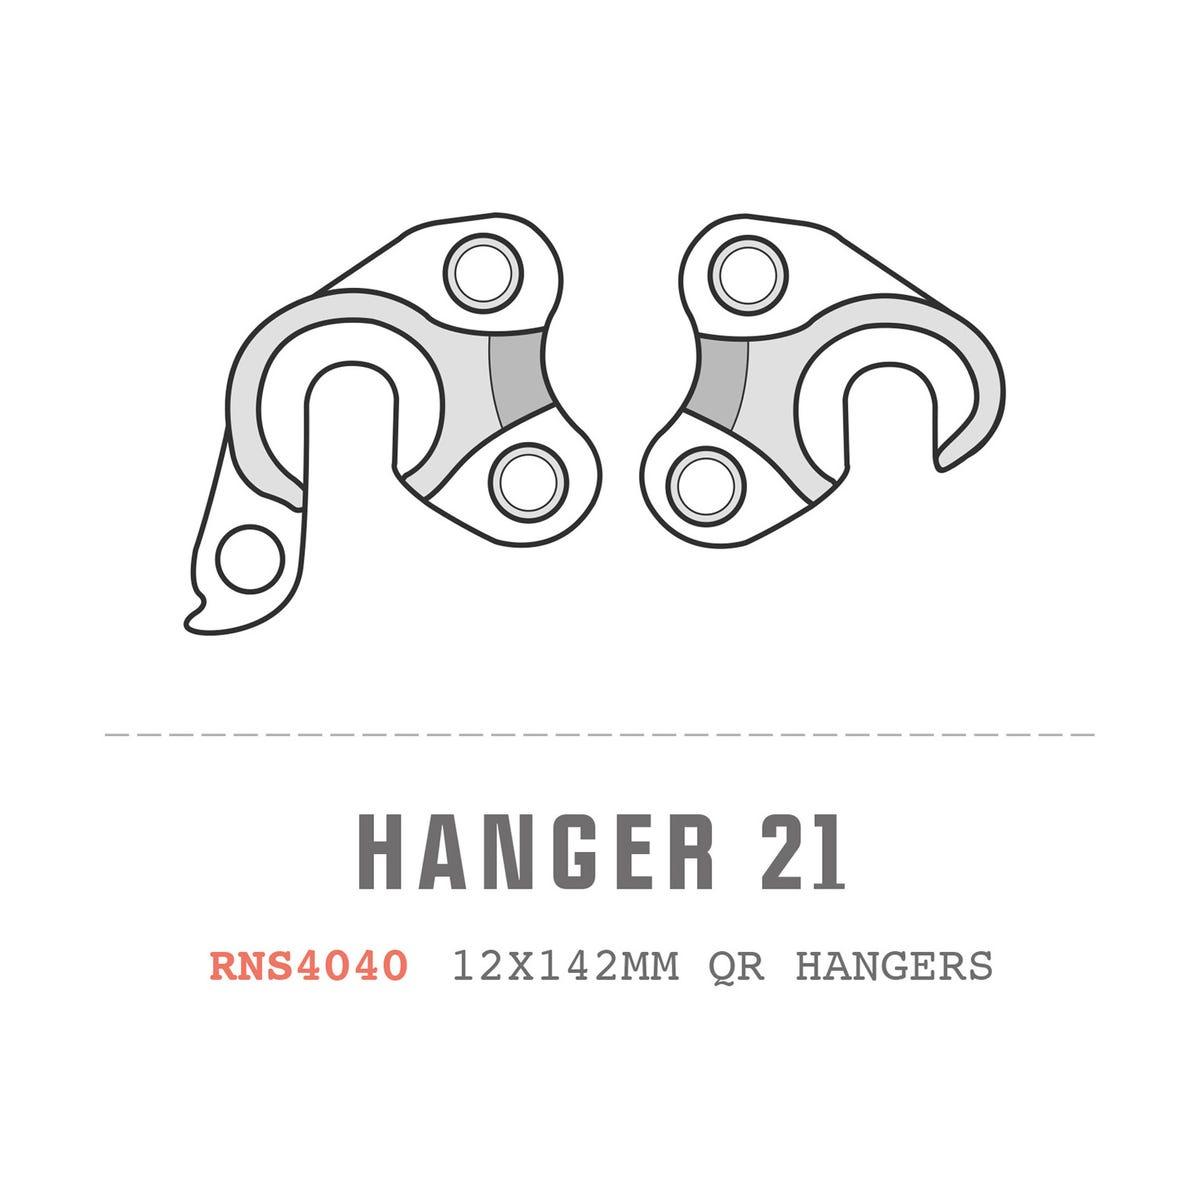 Saracen Hanger 21 fits: All Ariel models (12x142mm hangers pair)